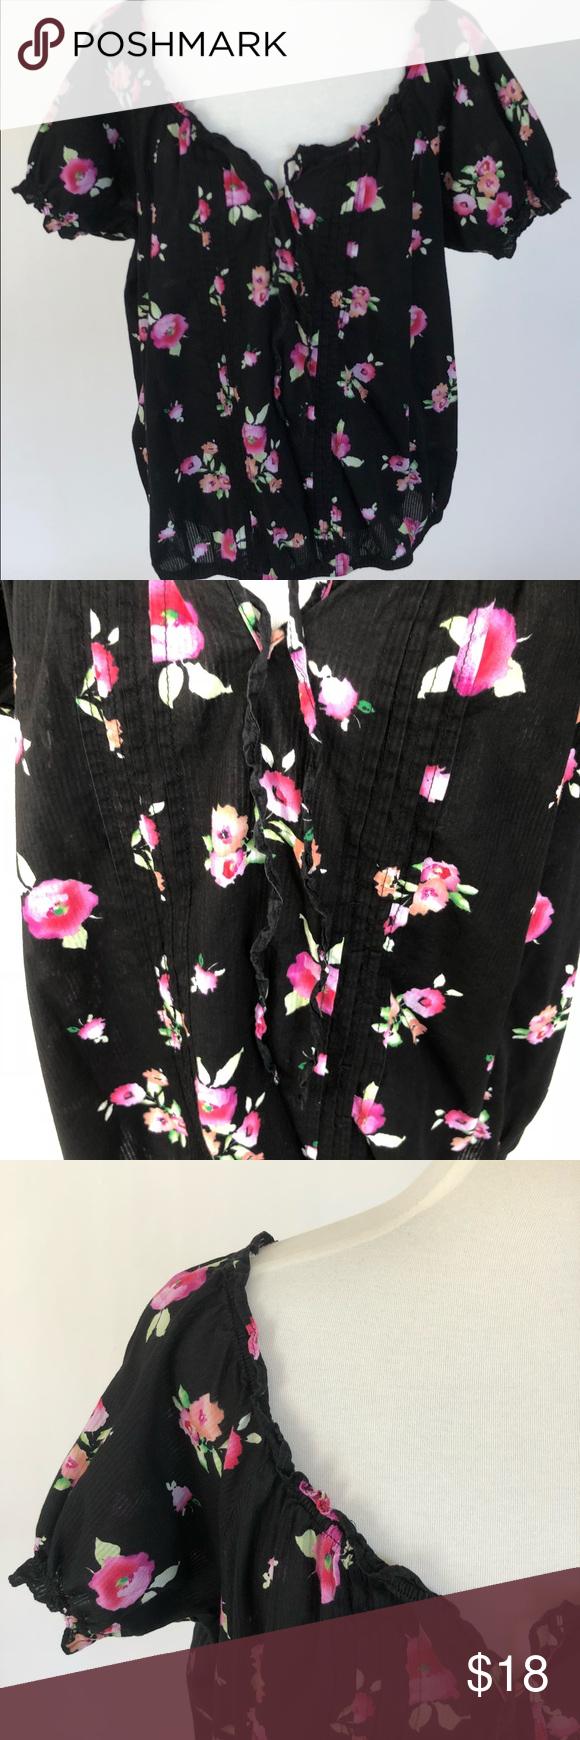 580dc290c867a Torrid Top Size 1 Black Roses Floral Elastic Hem